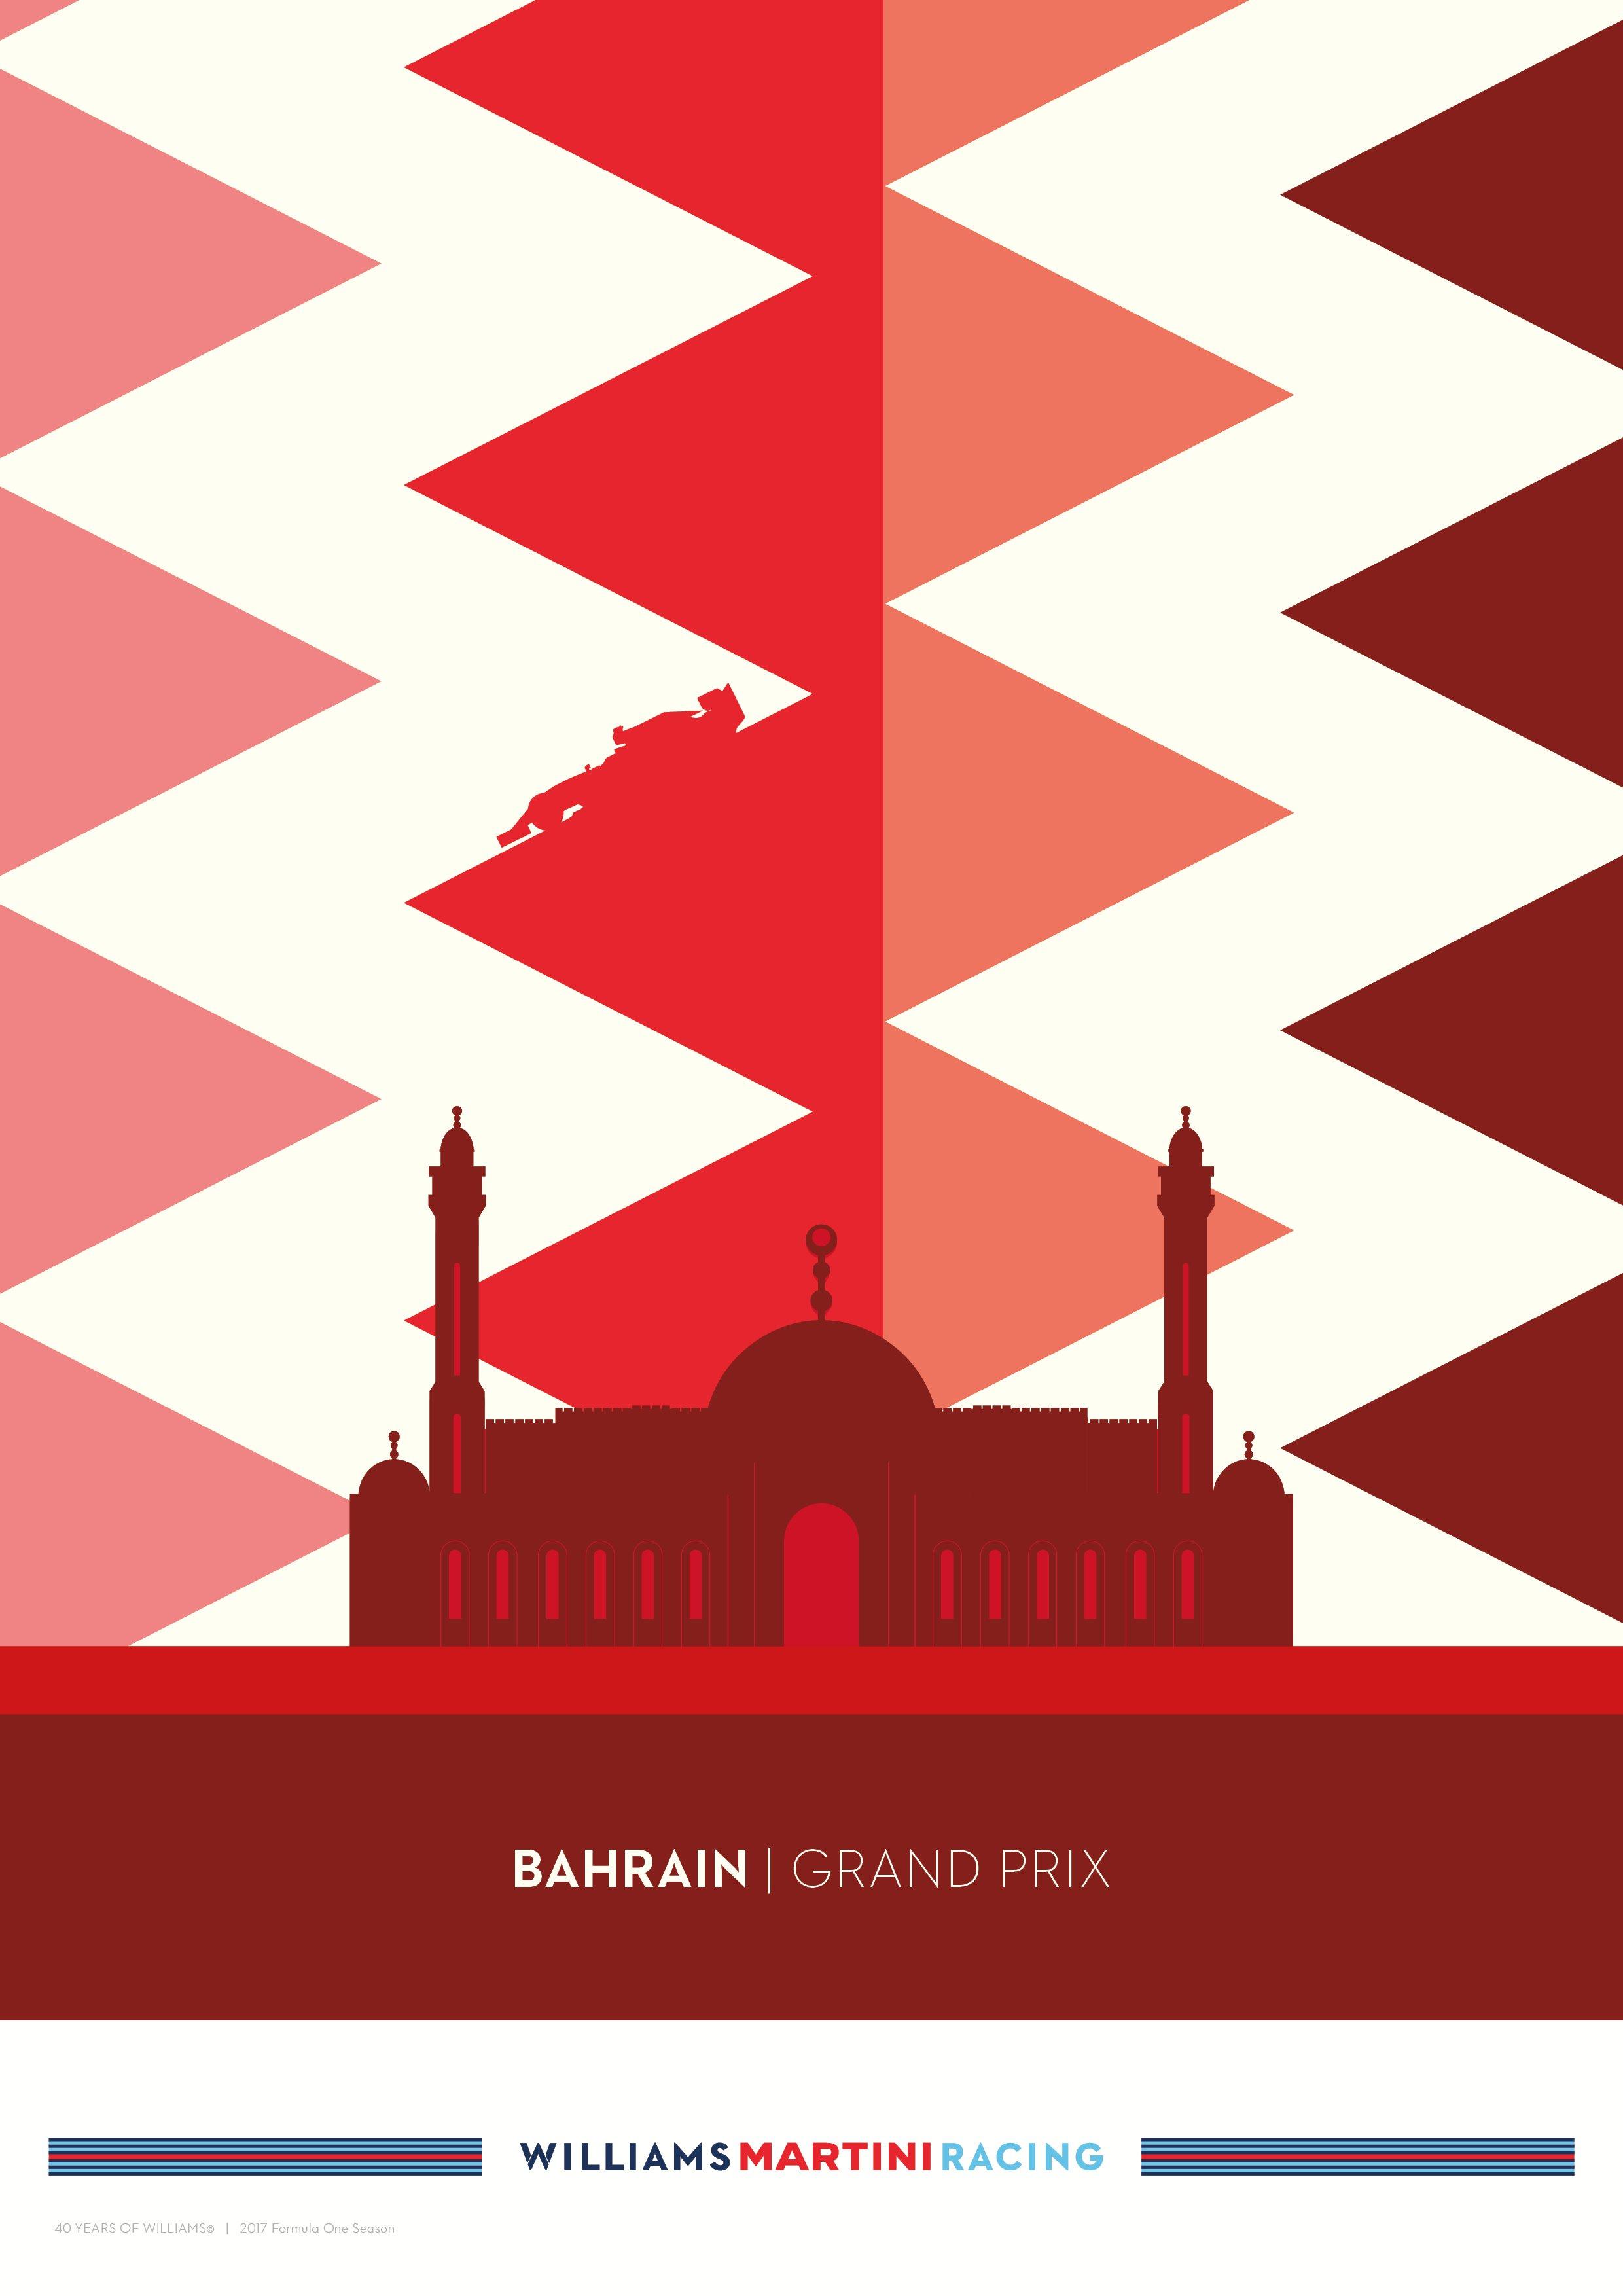 bahrain-gp-williams-poster-2017.jpg